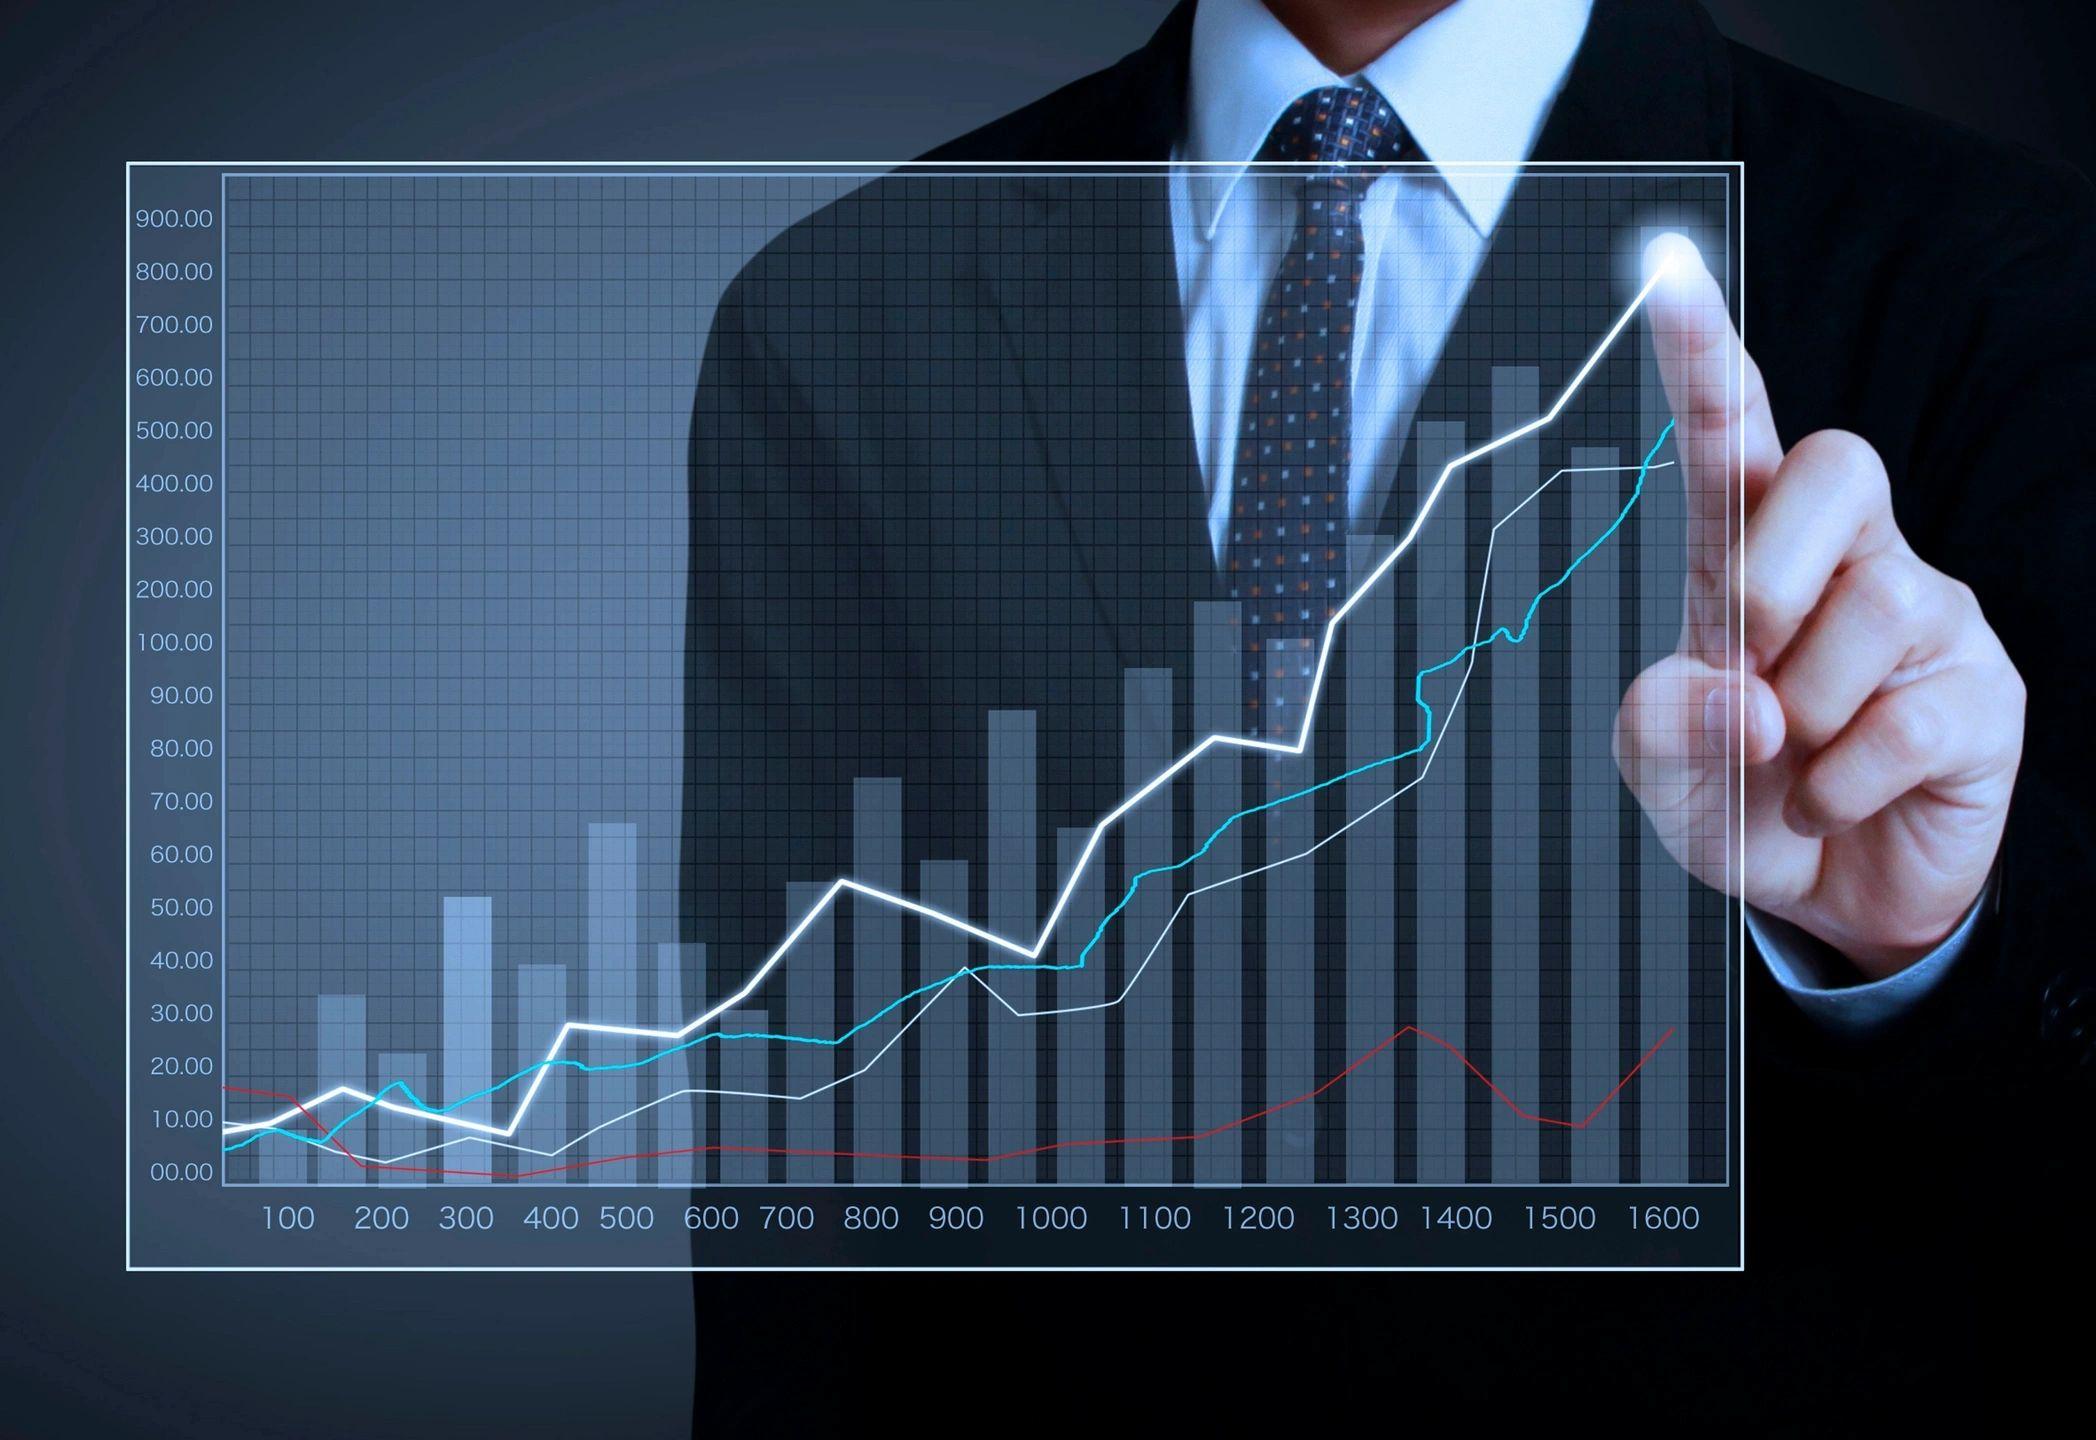 Stock Market Returns: Never a Constant